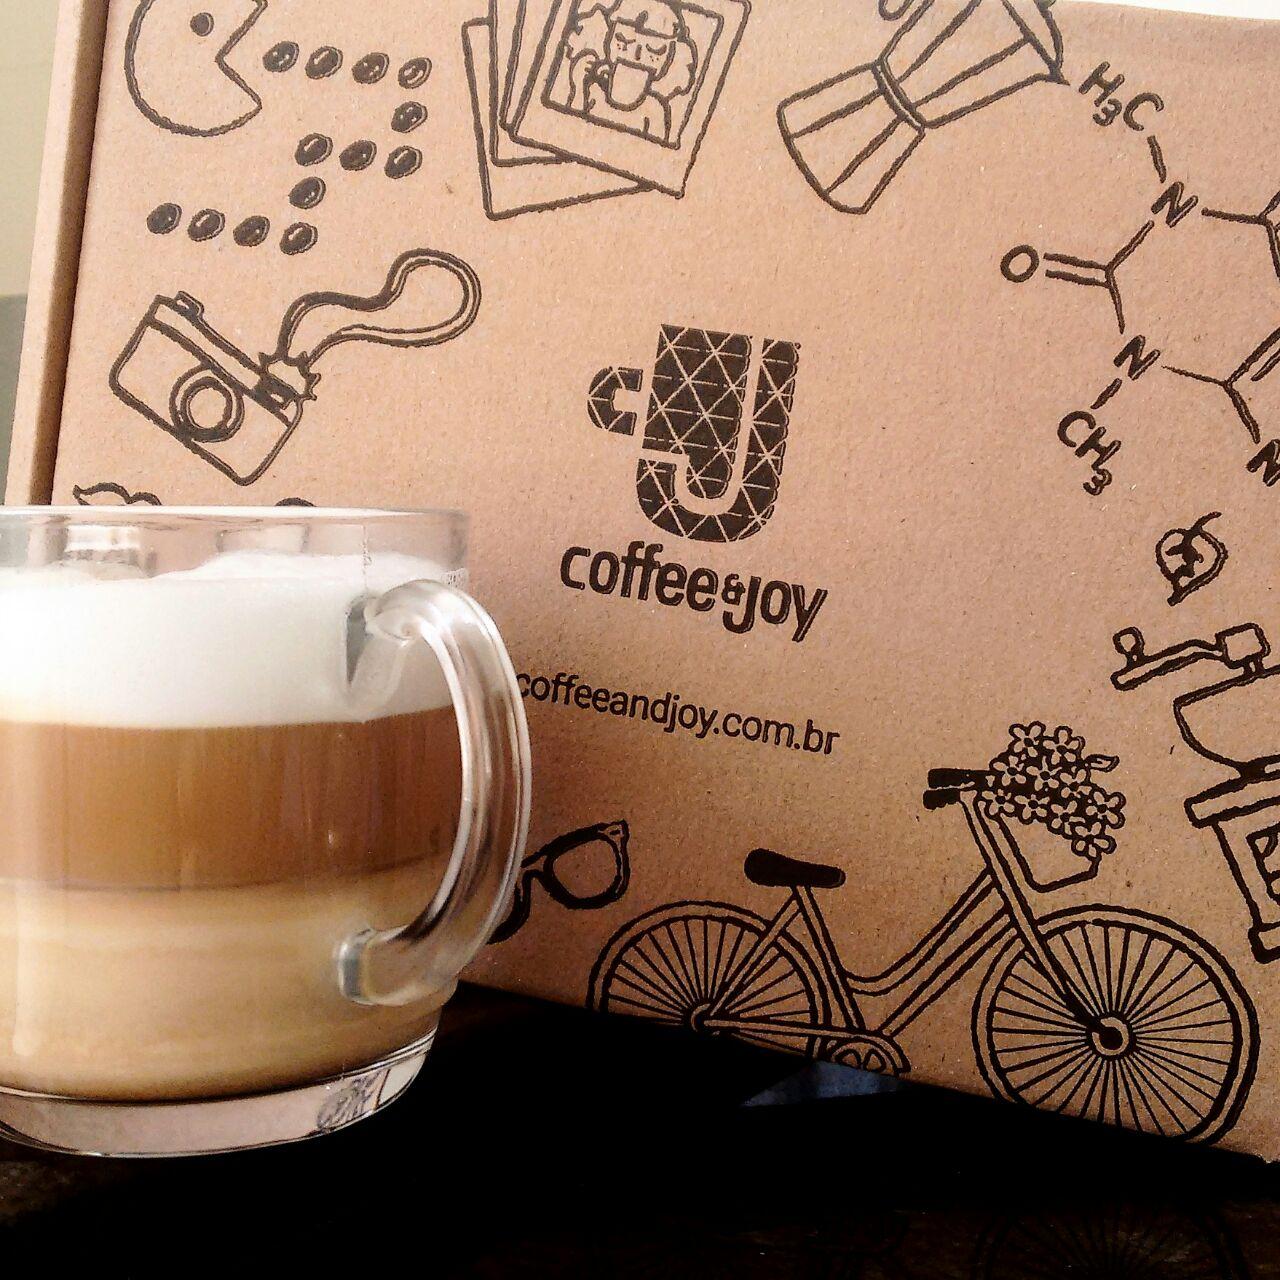 Capuccino Coffee & Joy - Cafés Incríveis aqui